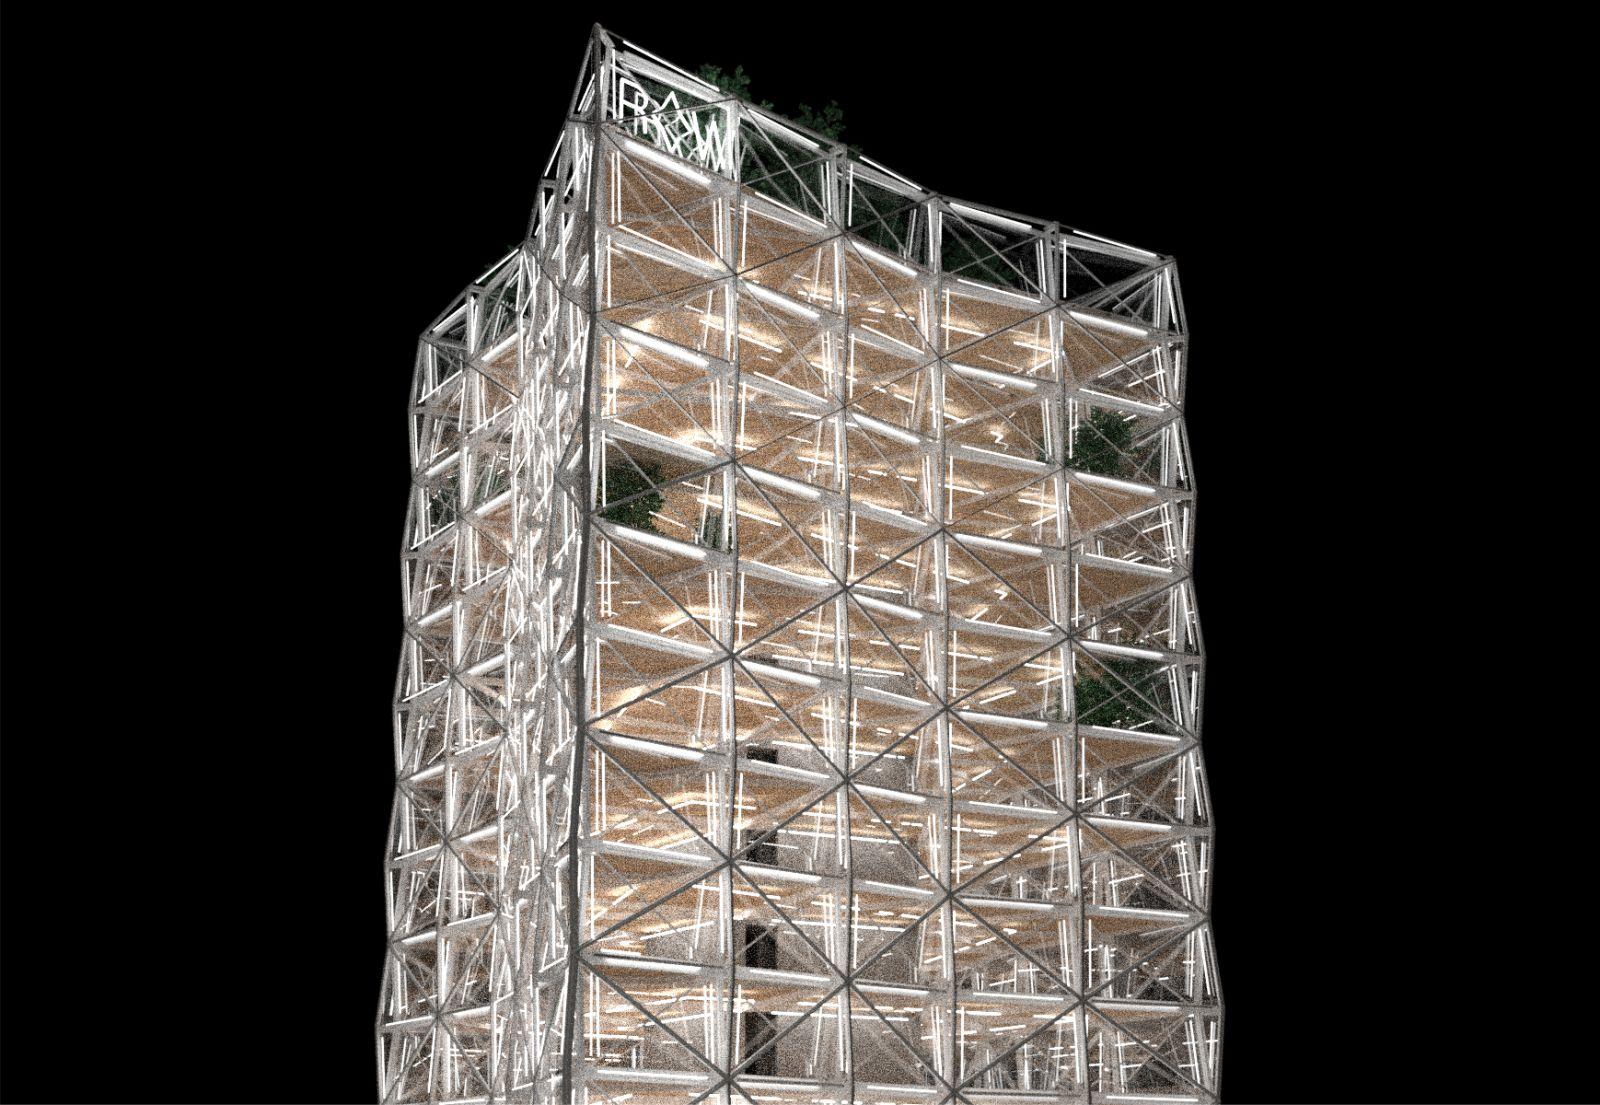 RAW tower